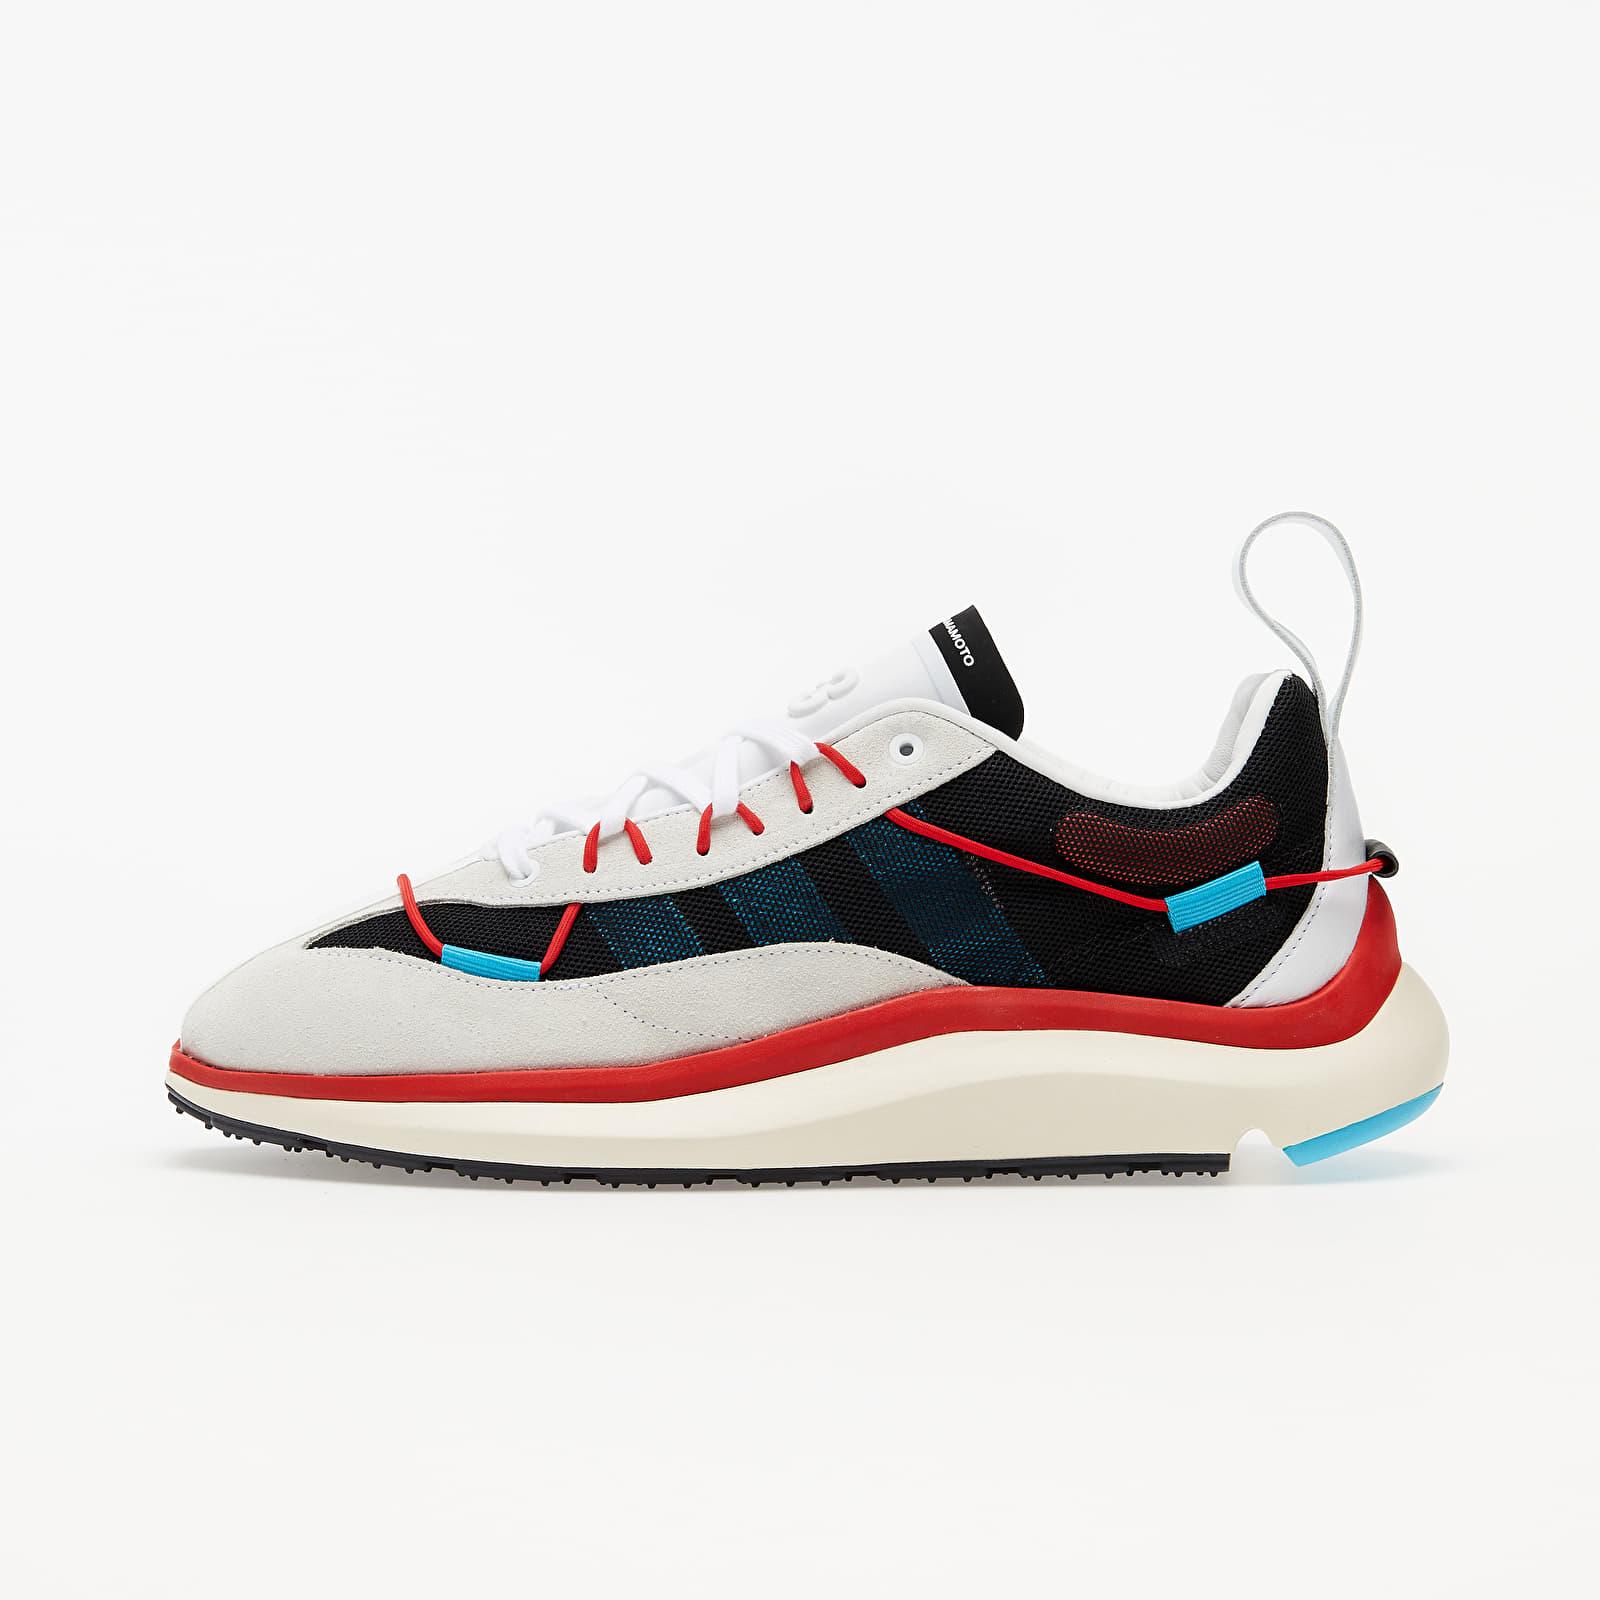 Chaussures et baskets homme Y-3 Shiku Run None/ None/ None